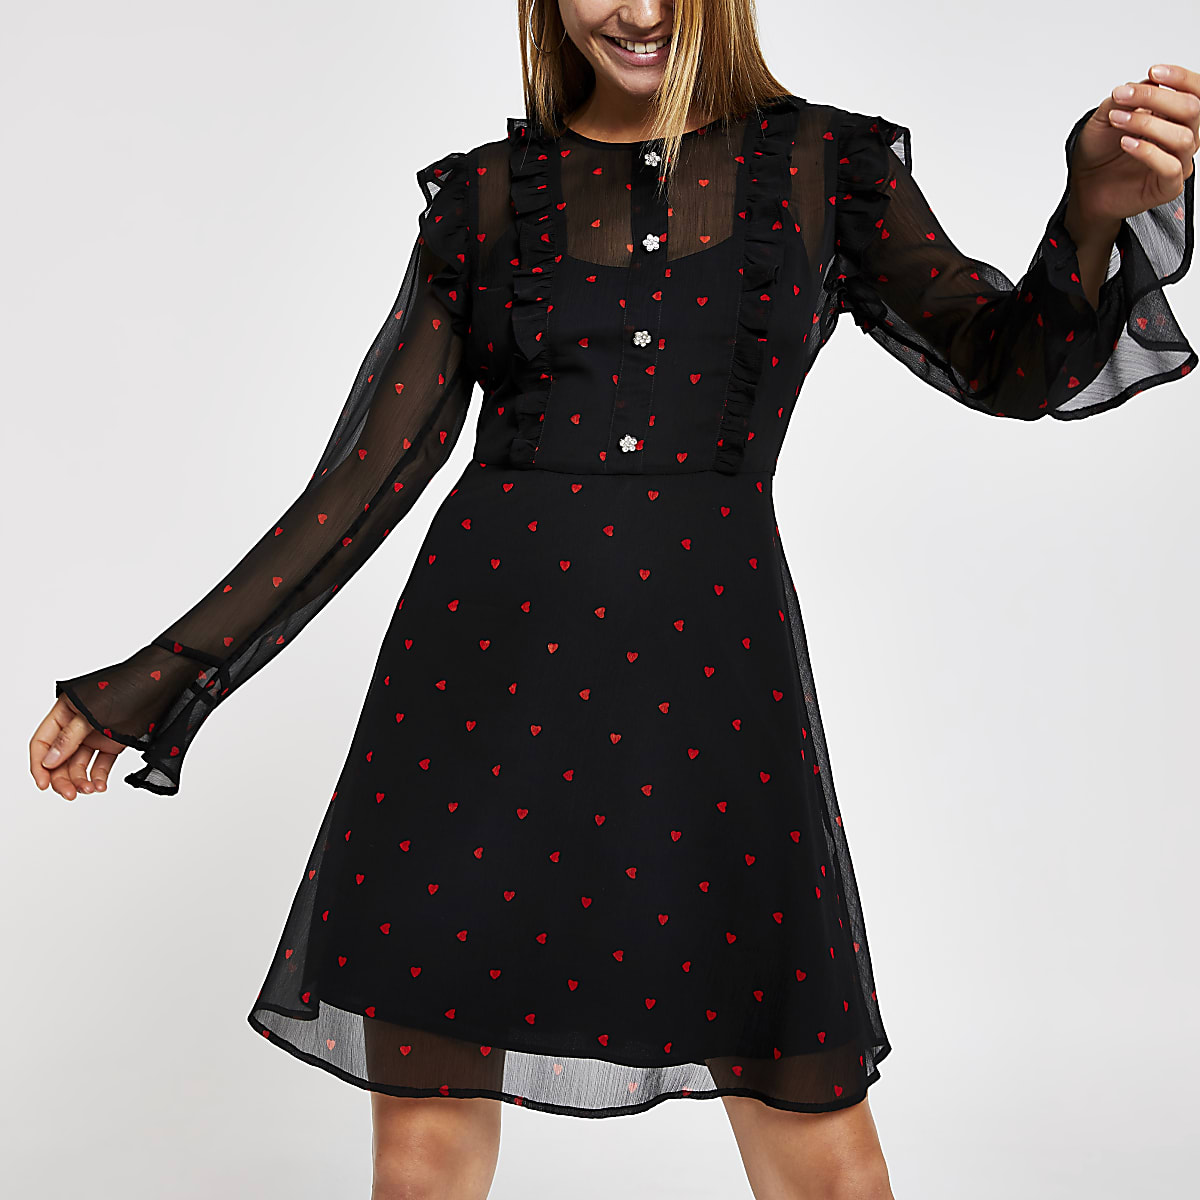 Black heart print sheer mini dress